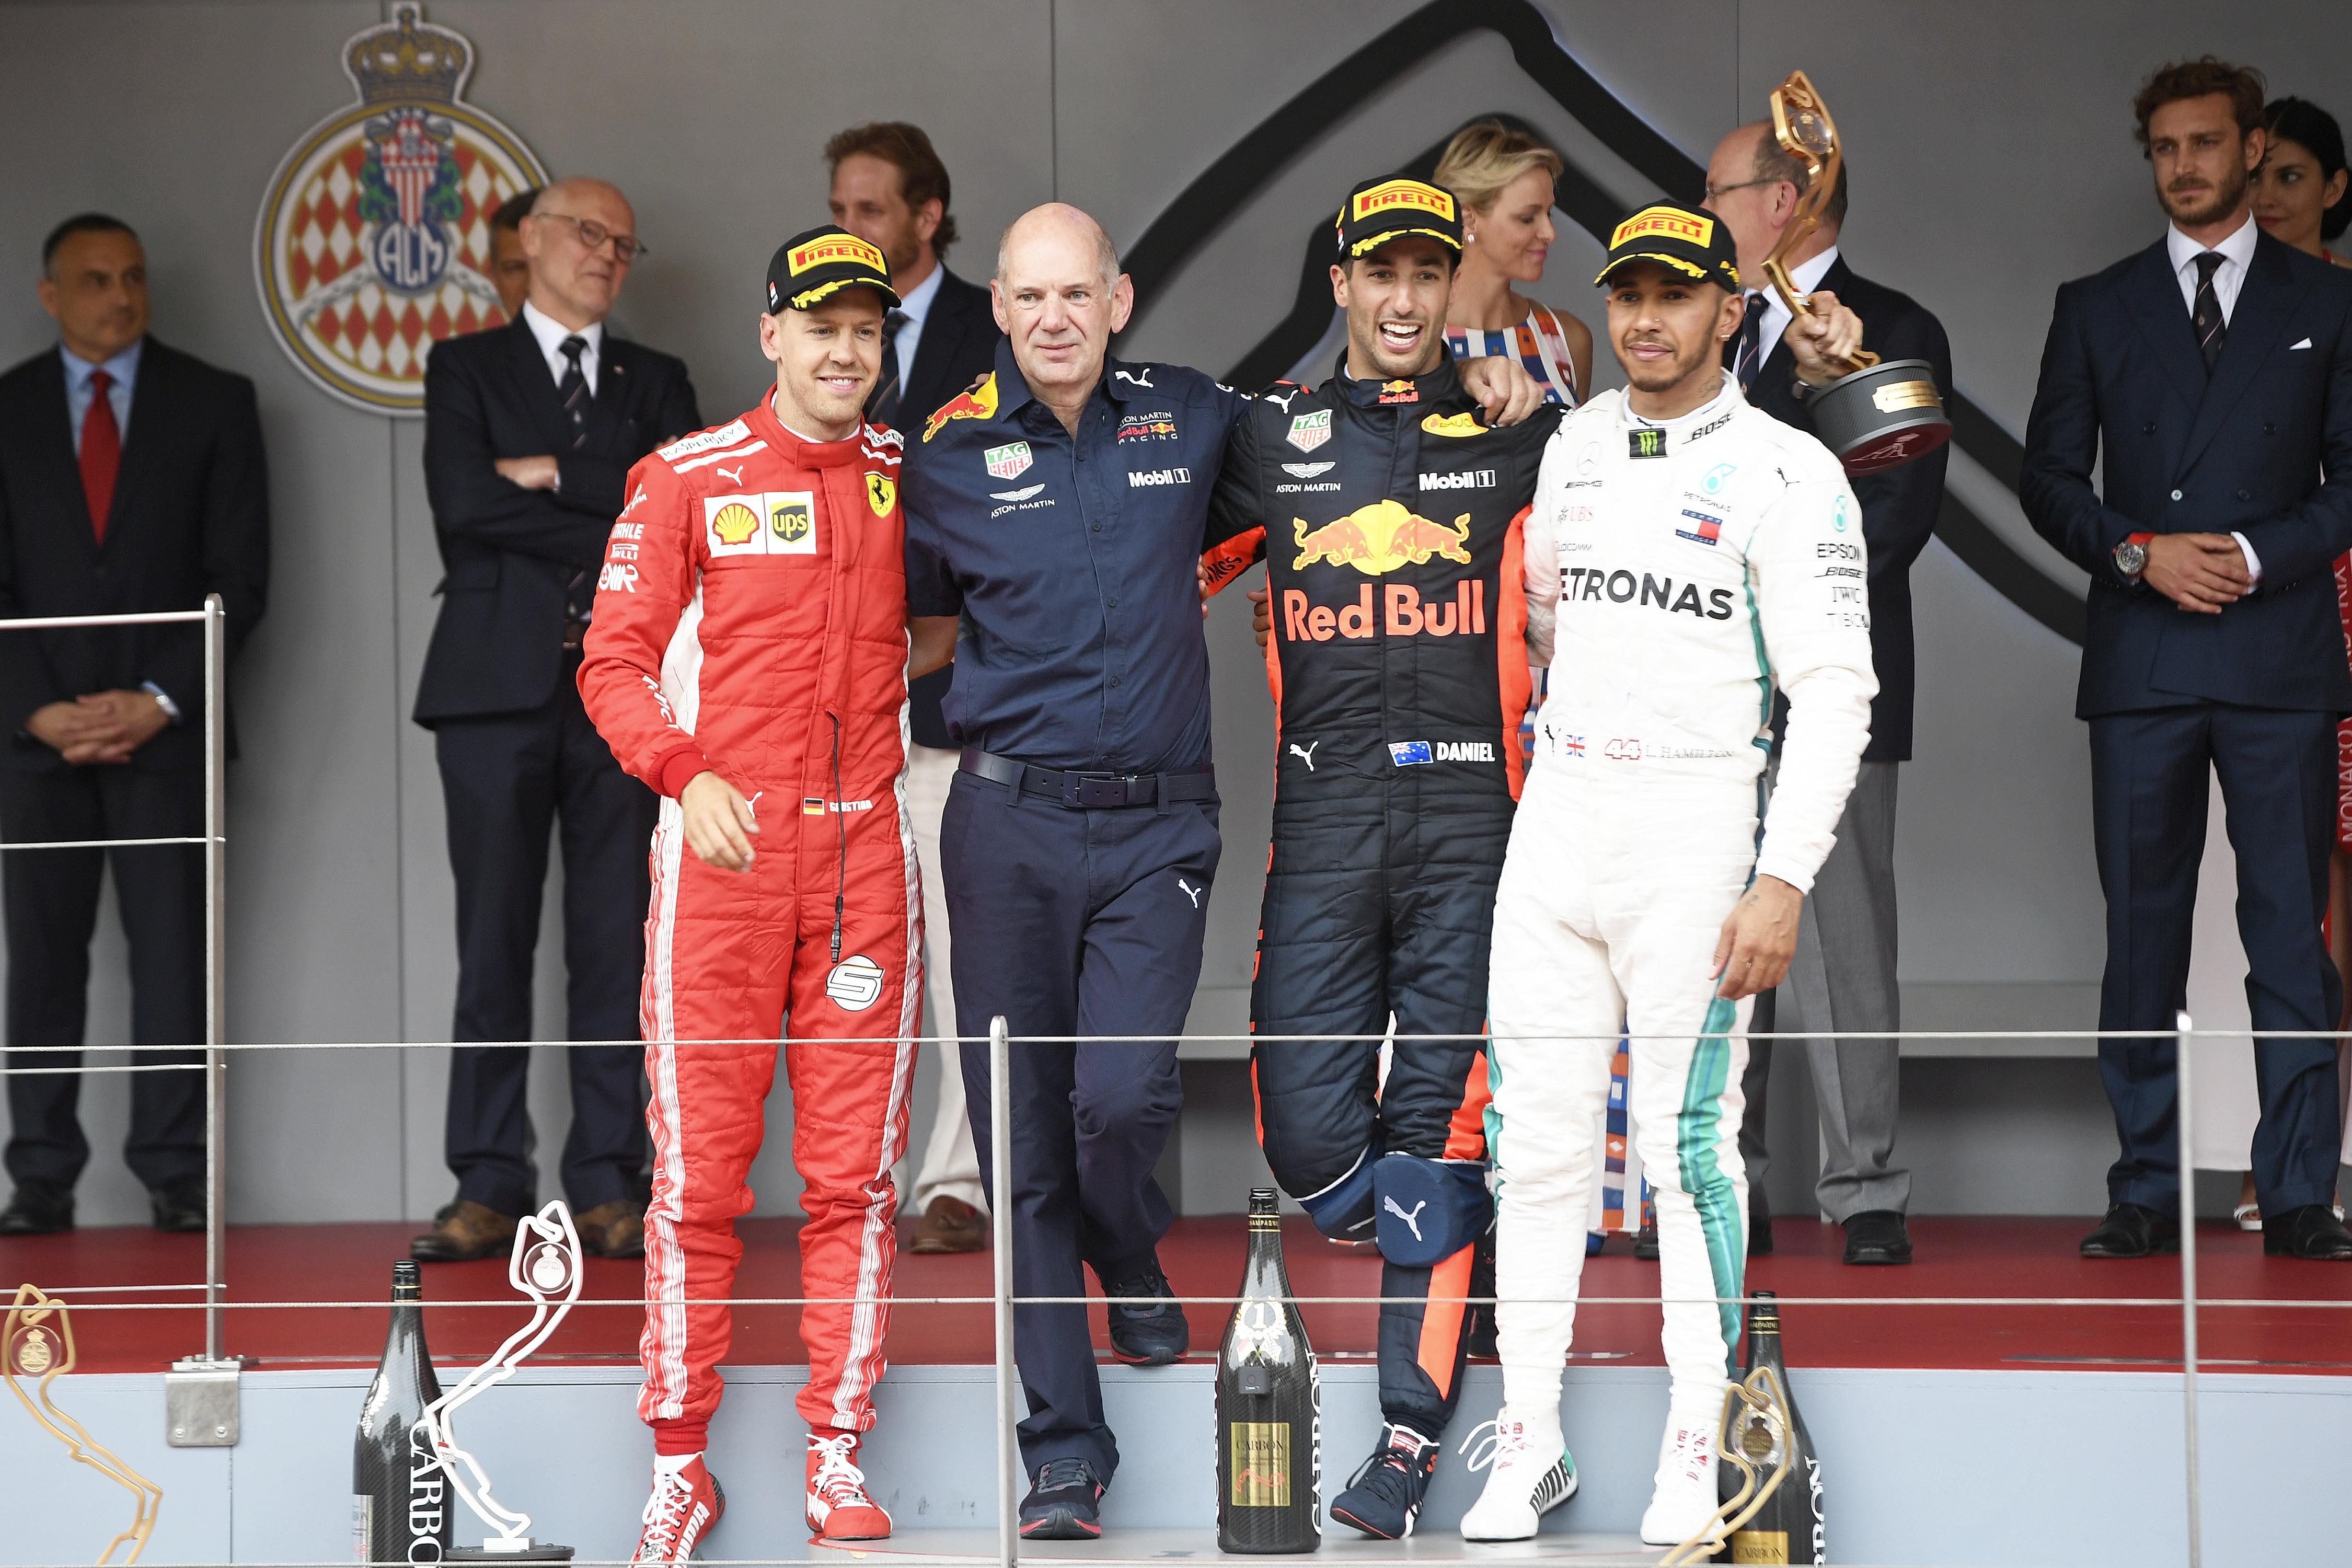 Matratzen Müller Hirschaid f1 post race press conference federation internationale de l